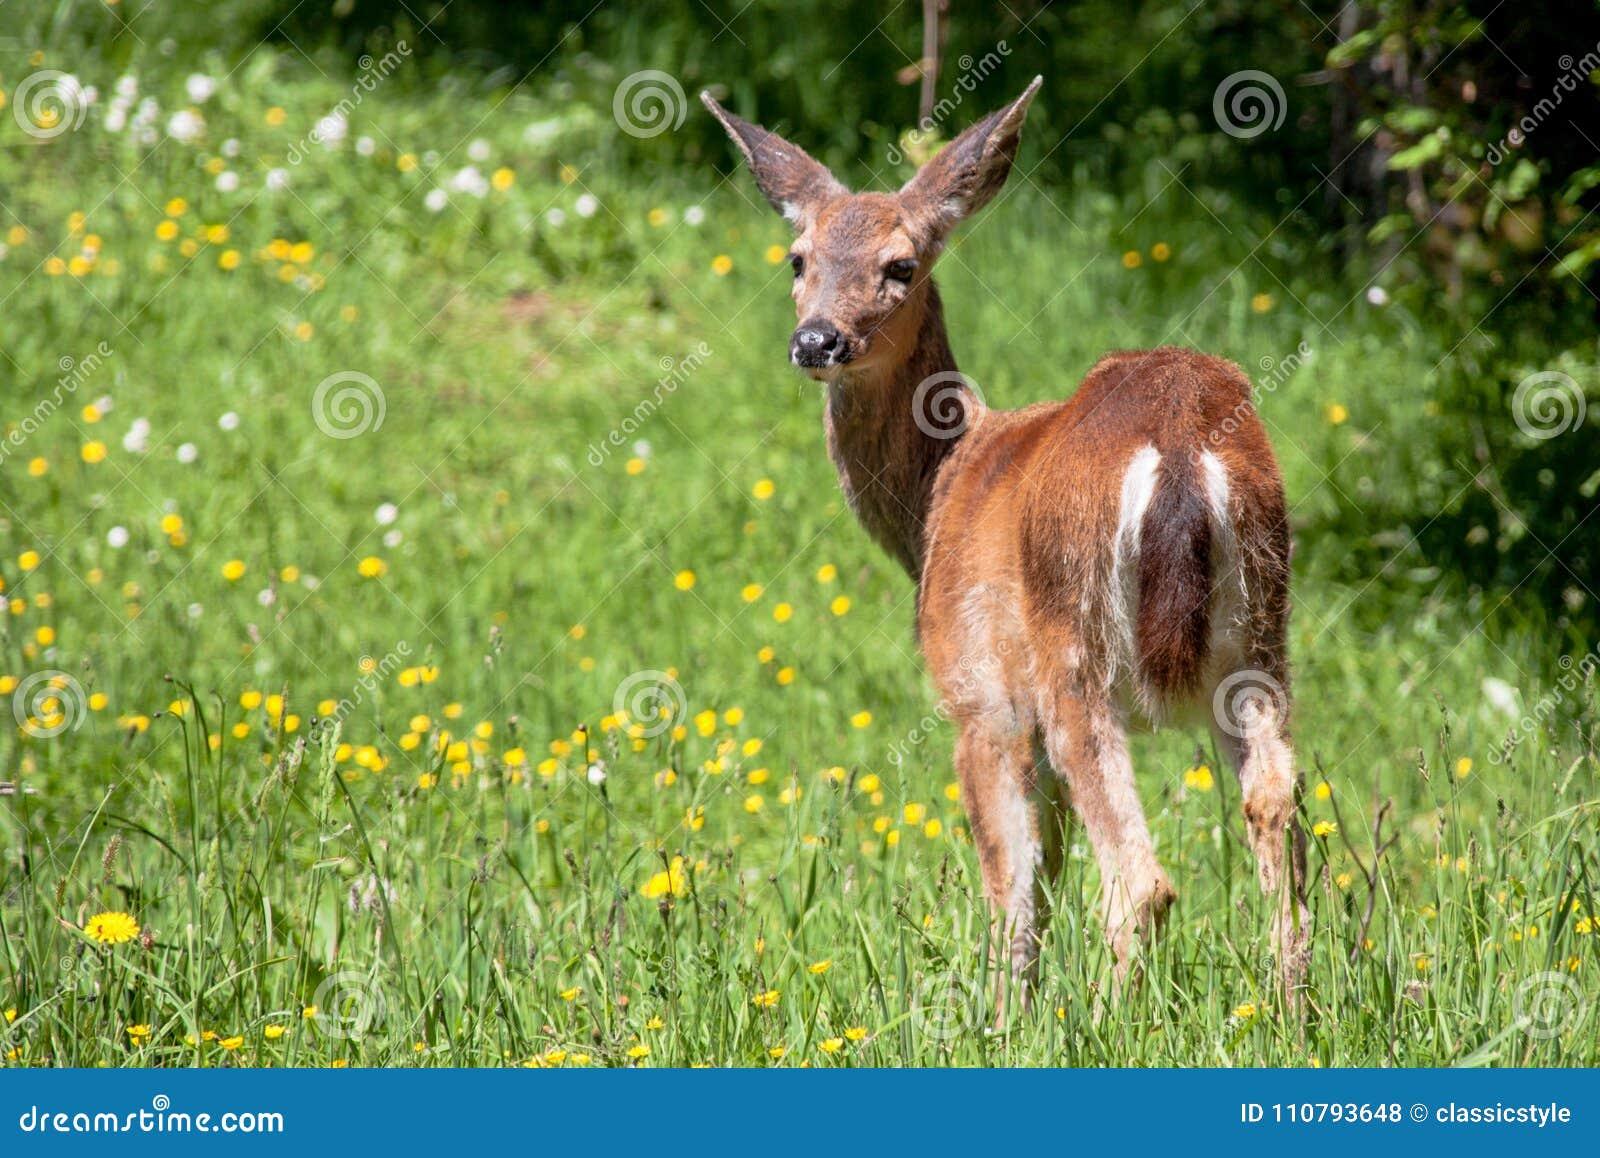 American black tail deer in a grassy field